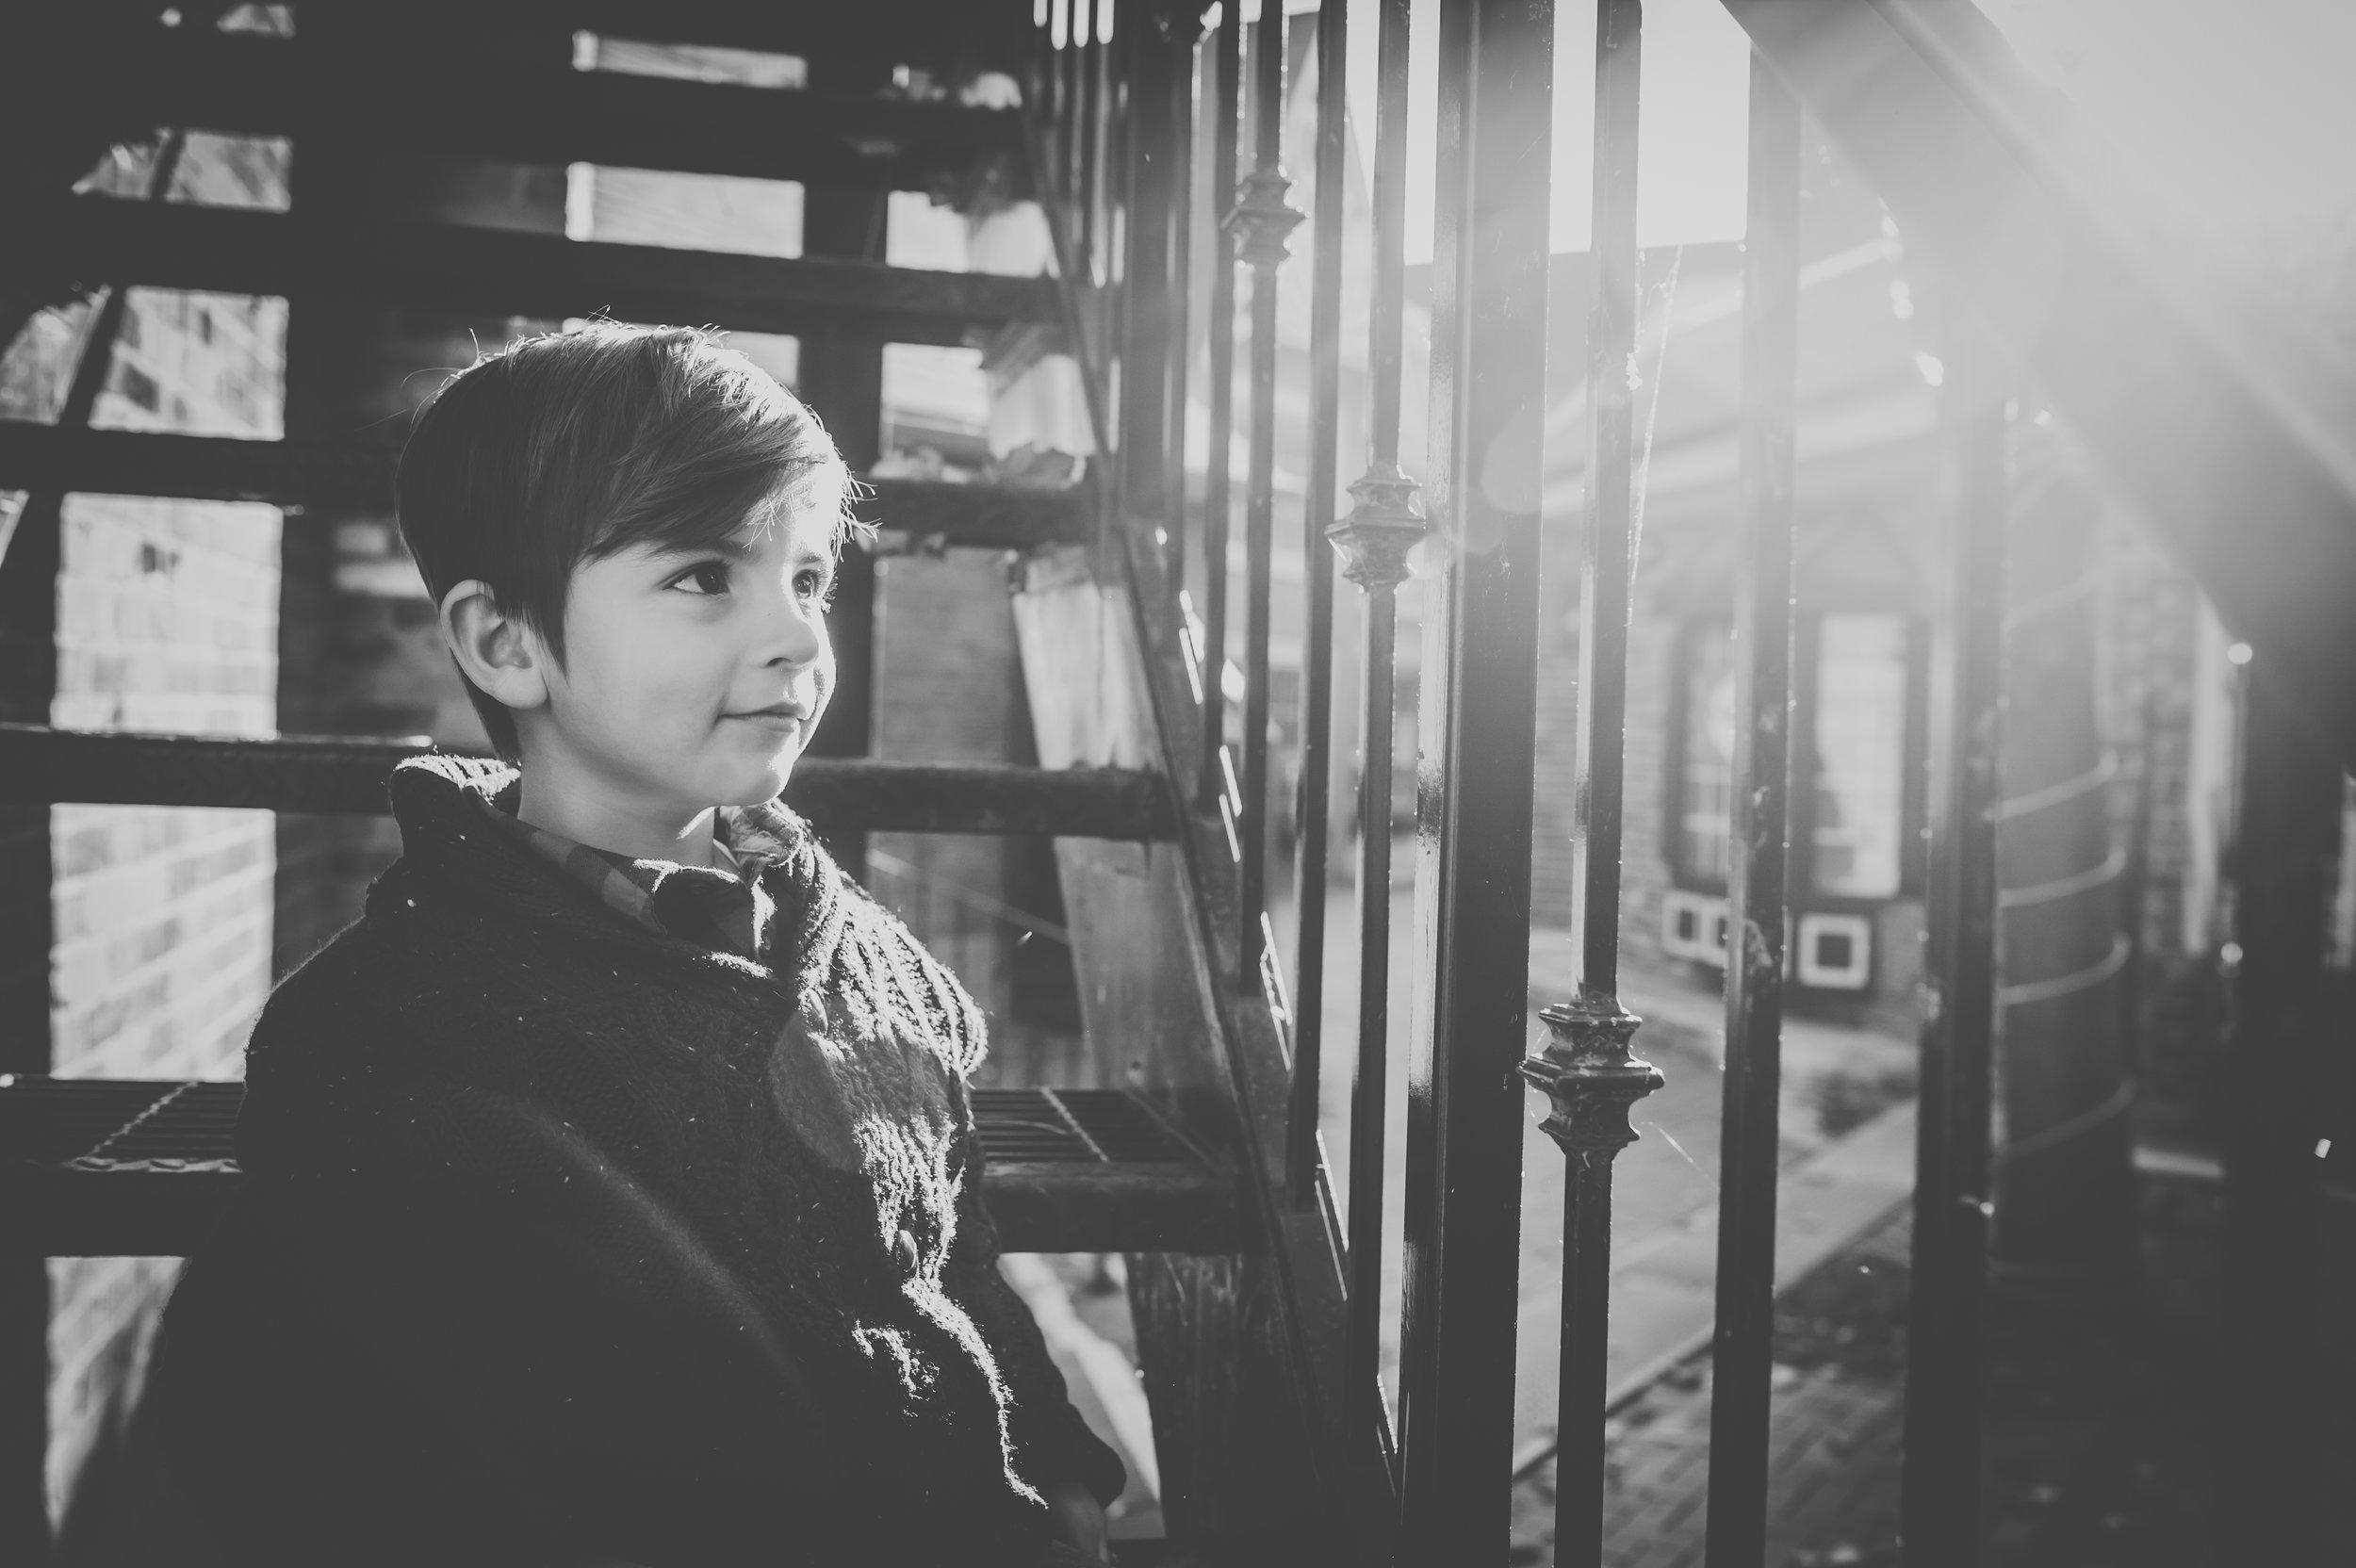 burlington children's photographer, children's photographer, lifestyle photographer